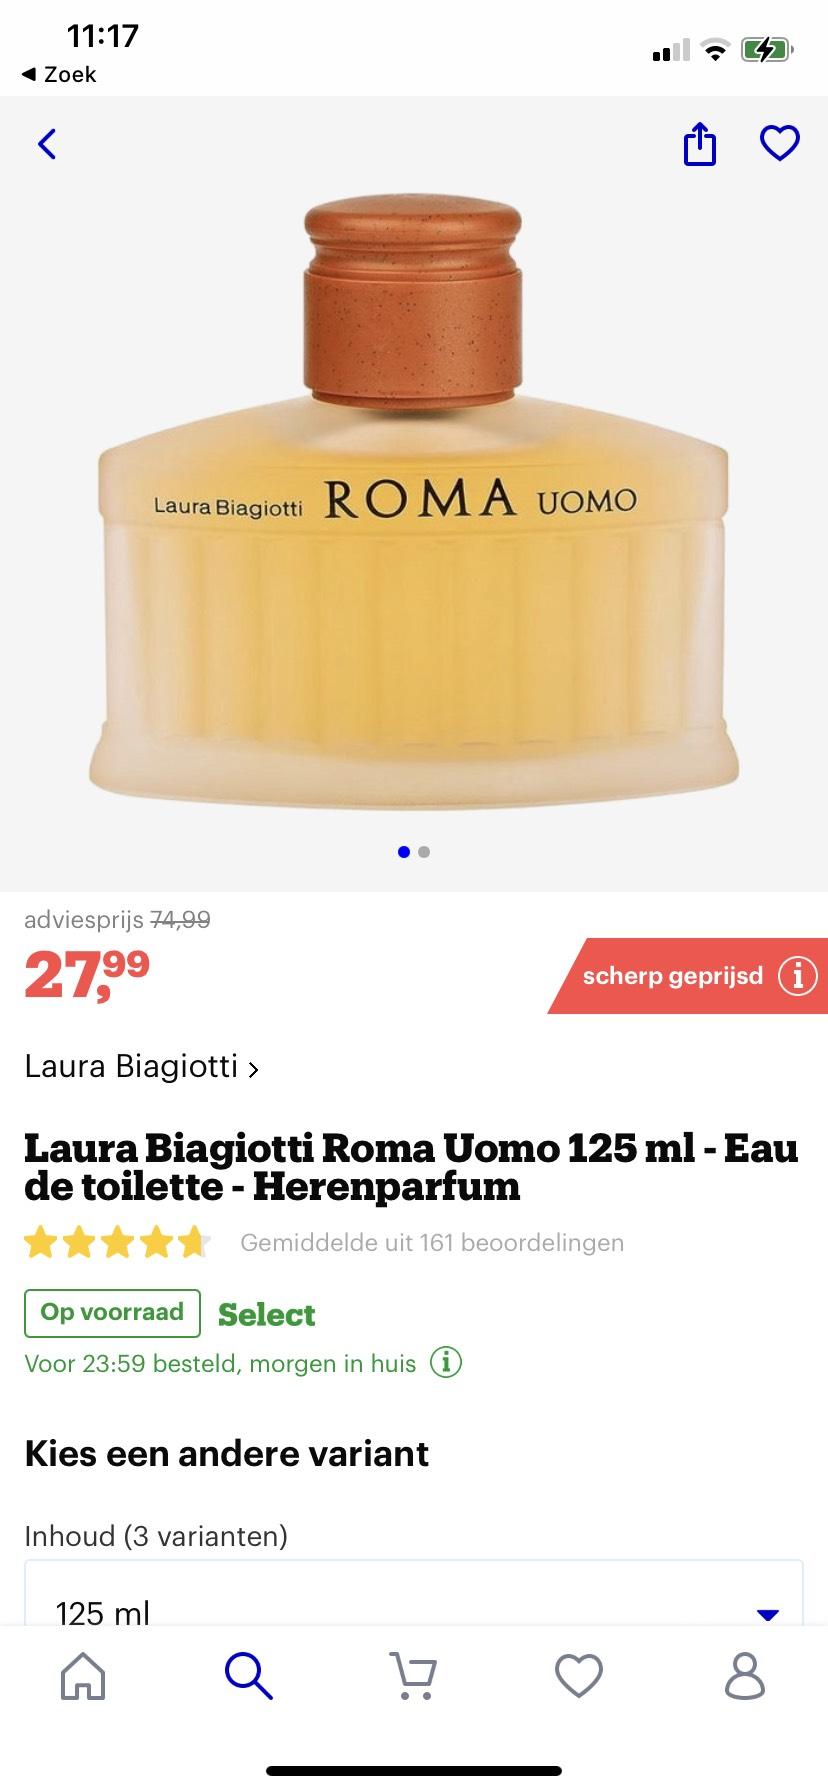 Laura Biagiotti Roma Uomo 125 ml parfum €27,99 @Bol.com